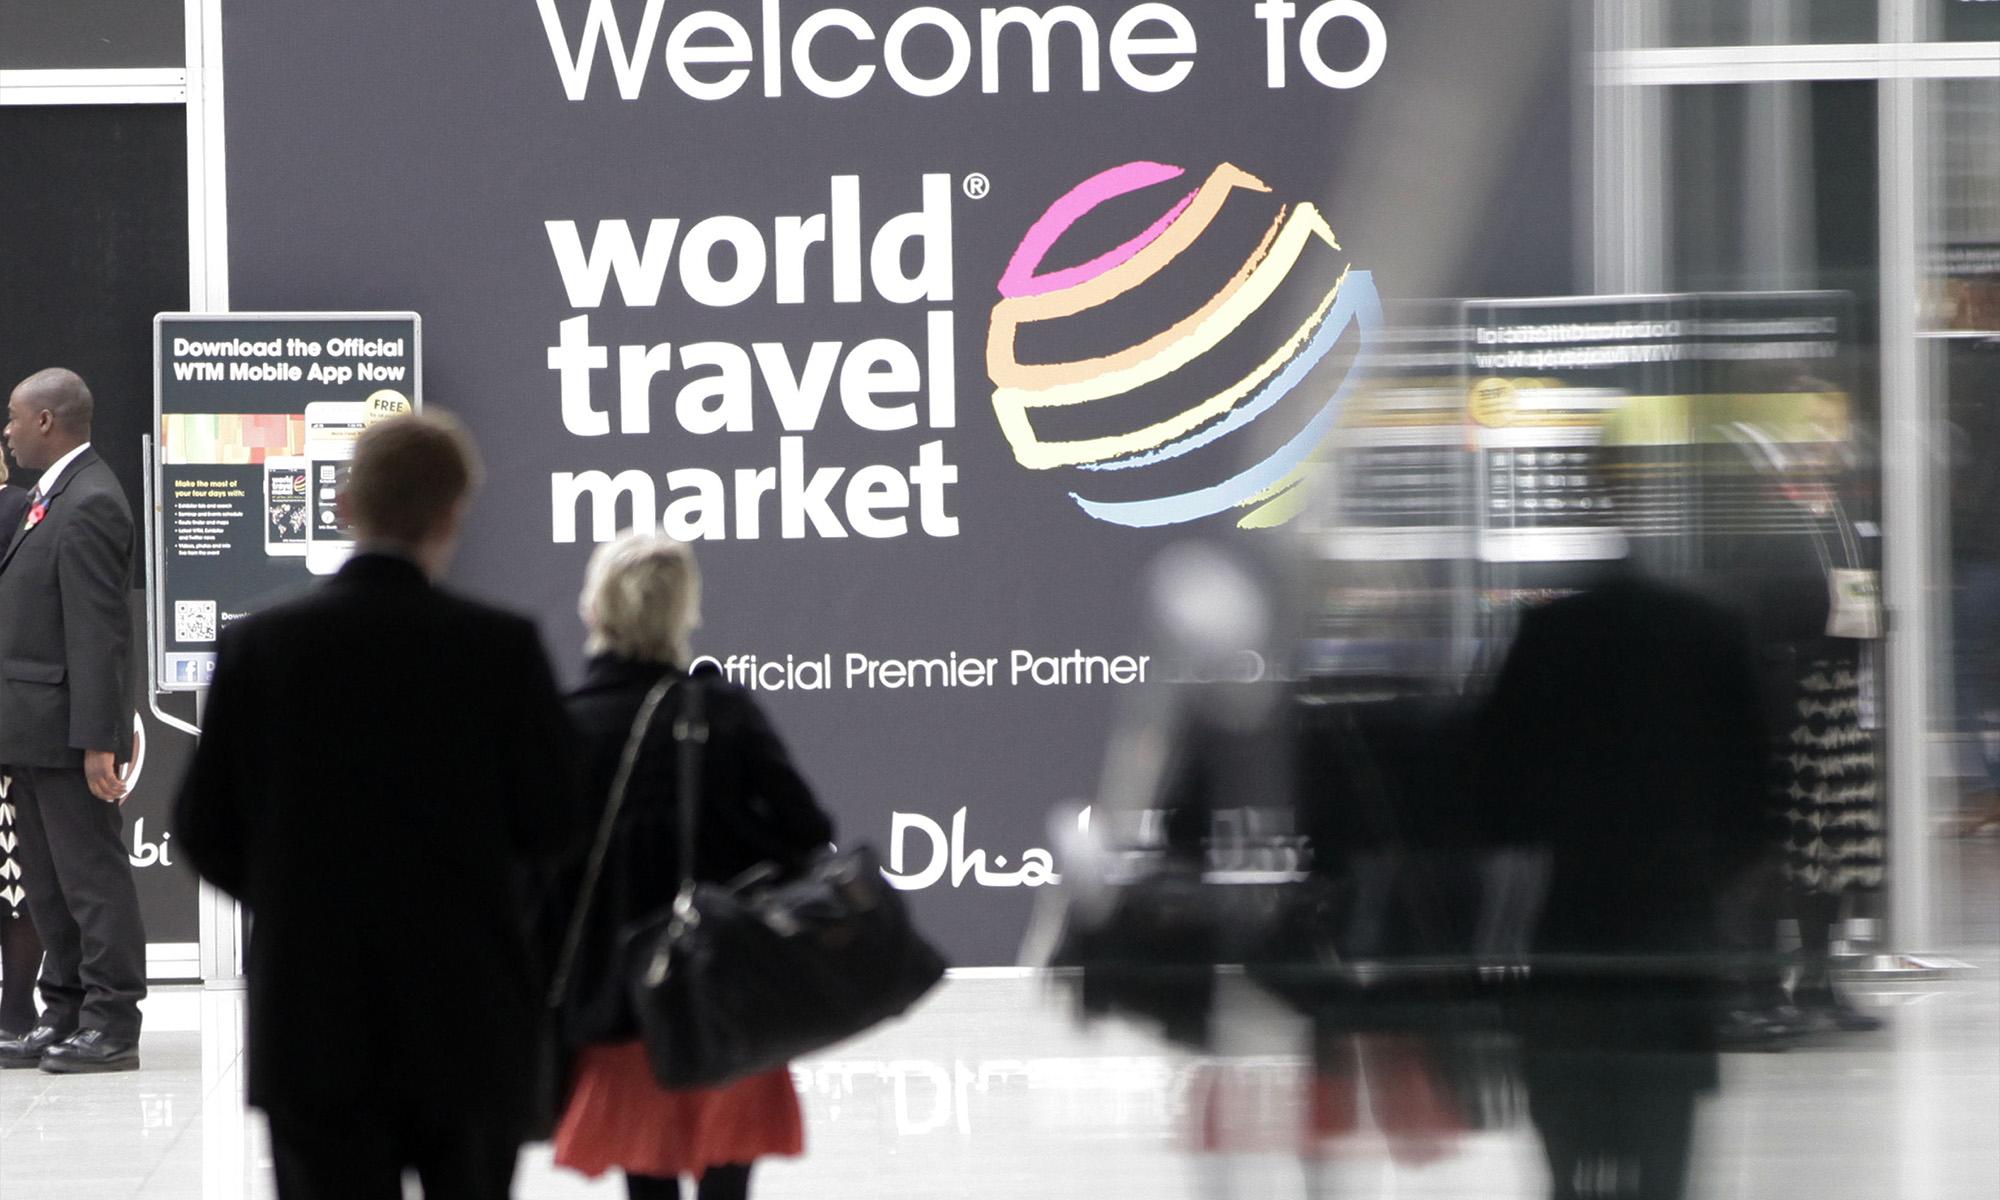 Highlights of the World Travel Market London 2017